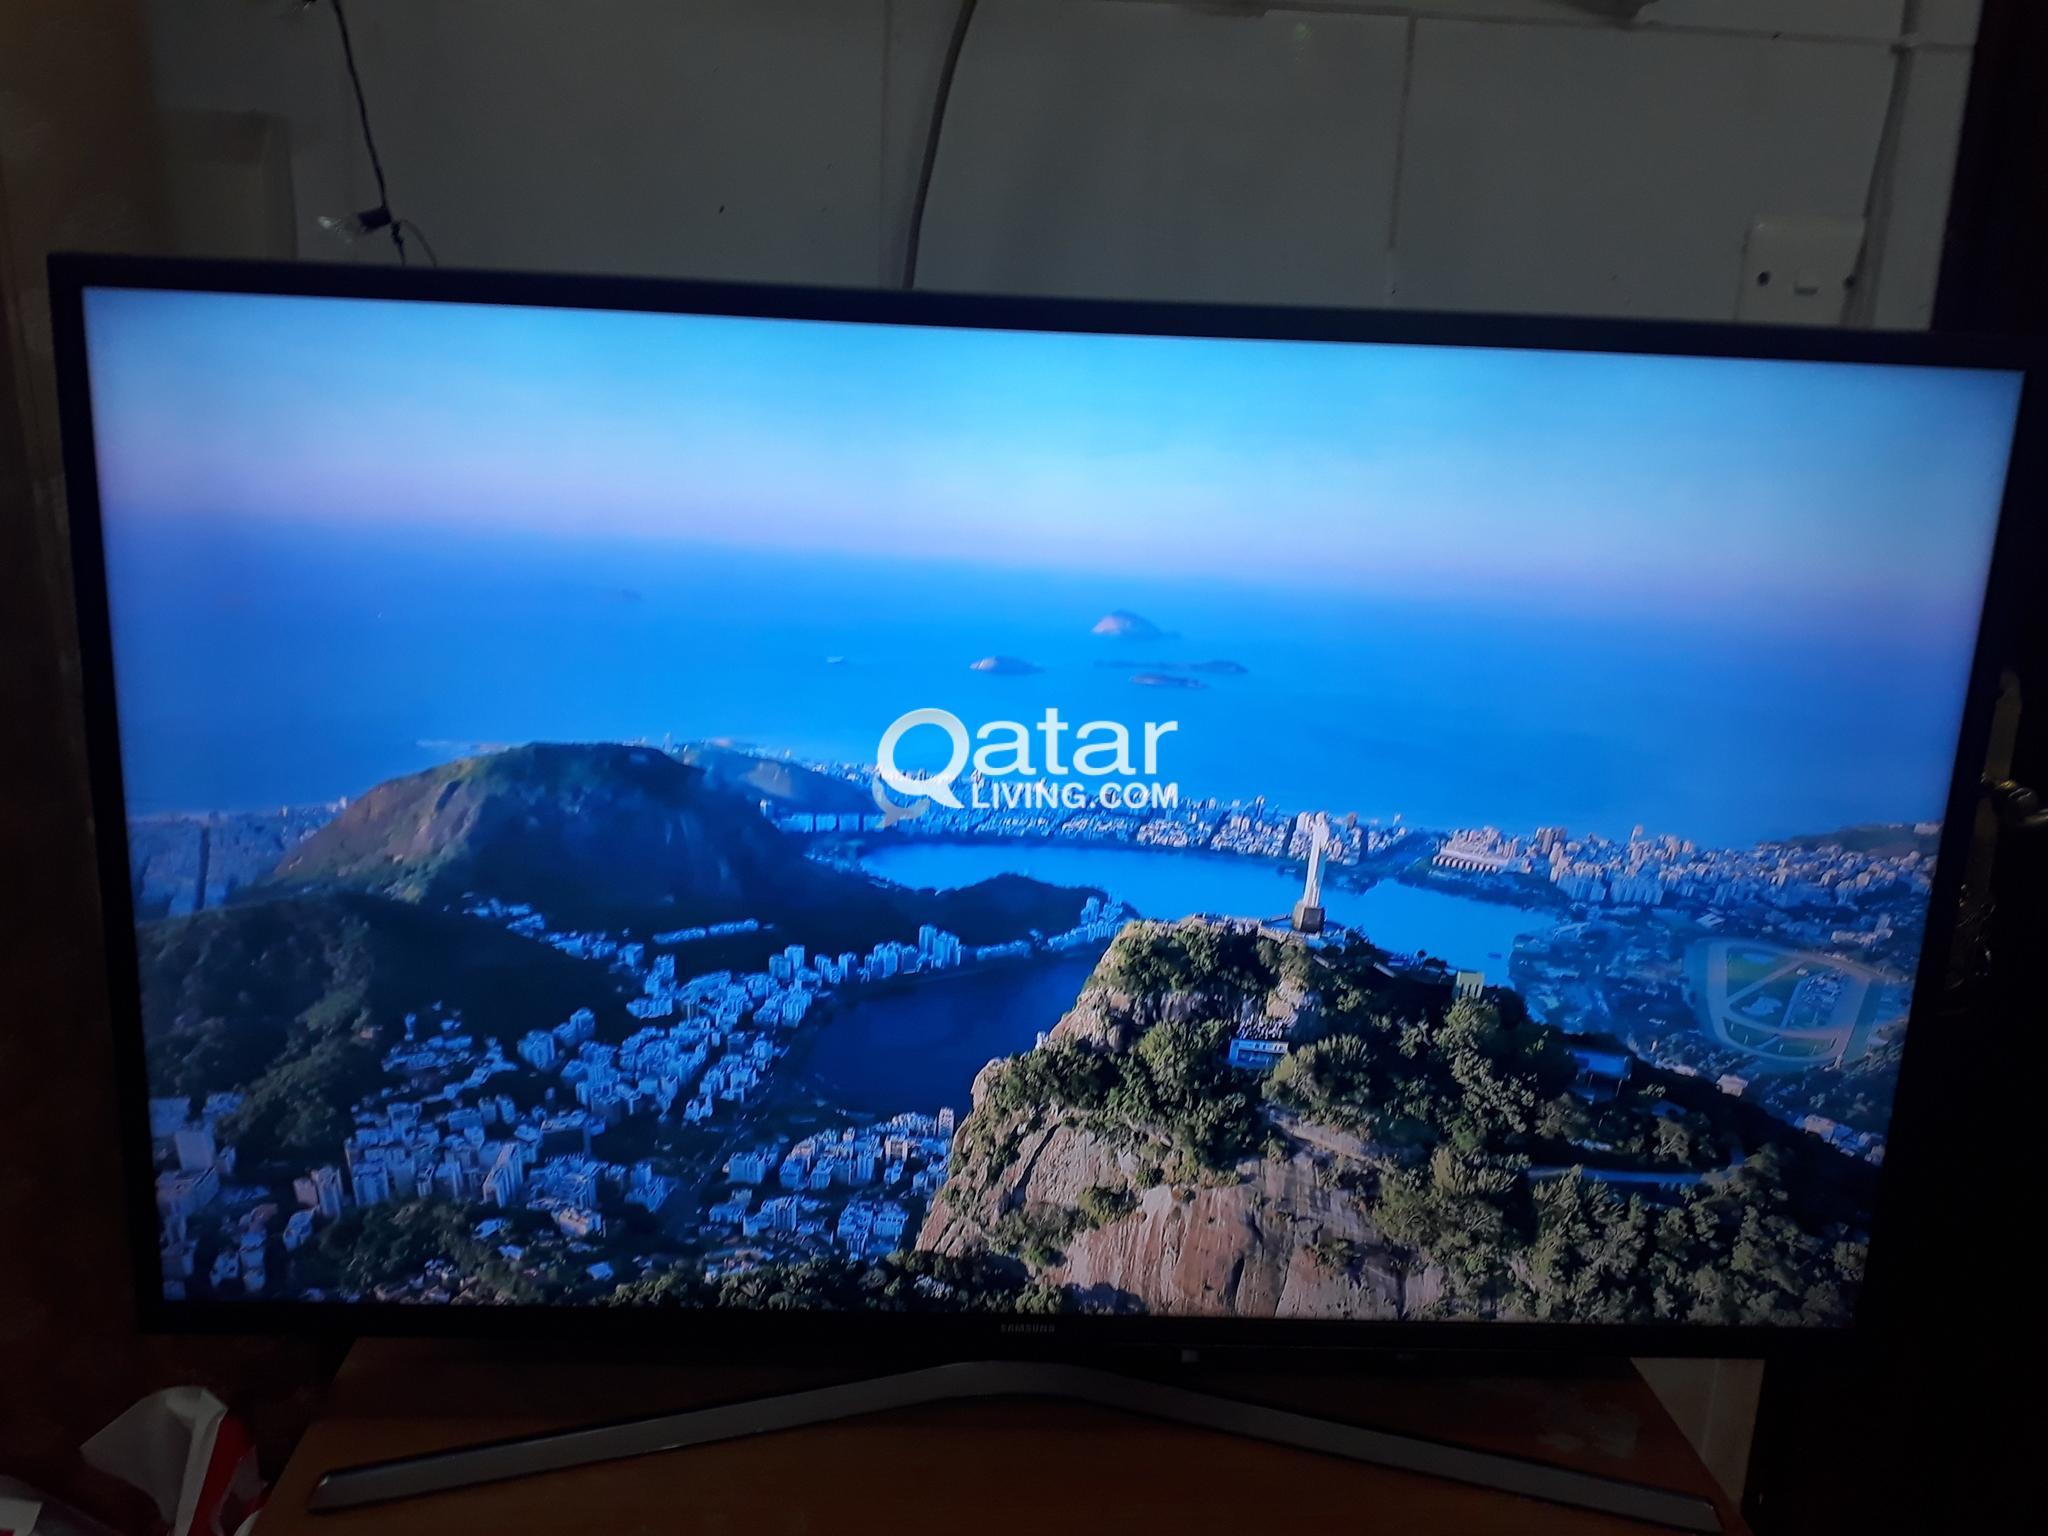 BIG OFFER SAMSUNG 4K UHD SMART TV 43 INCHES | Qatar Living